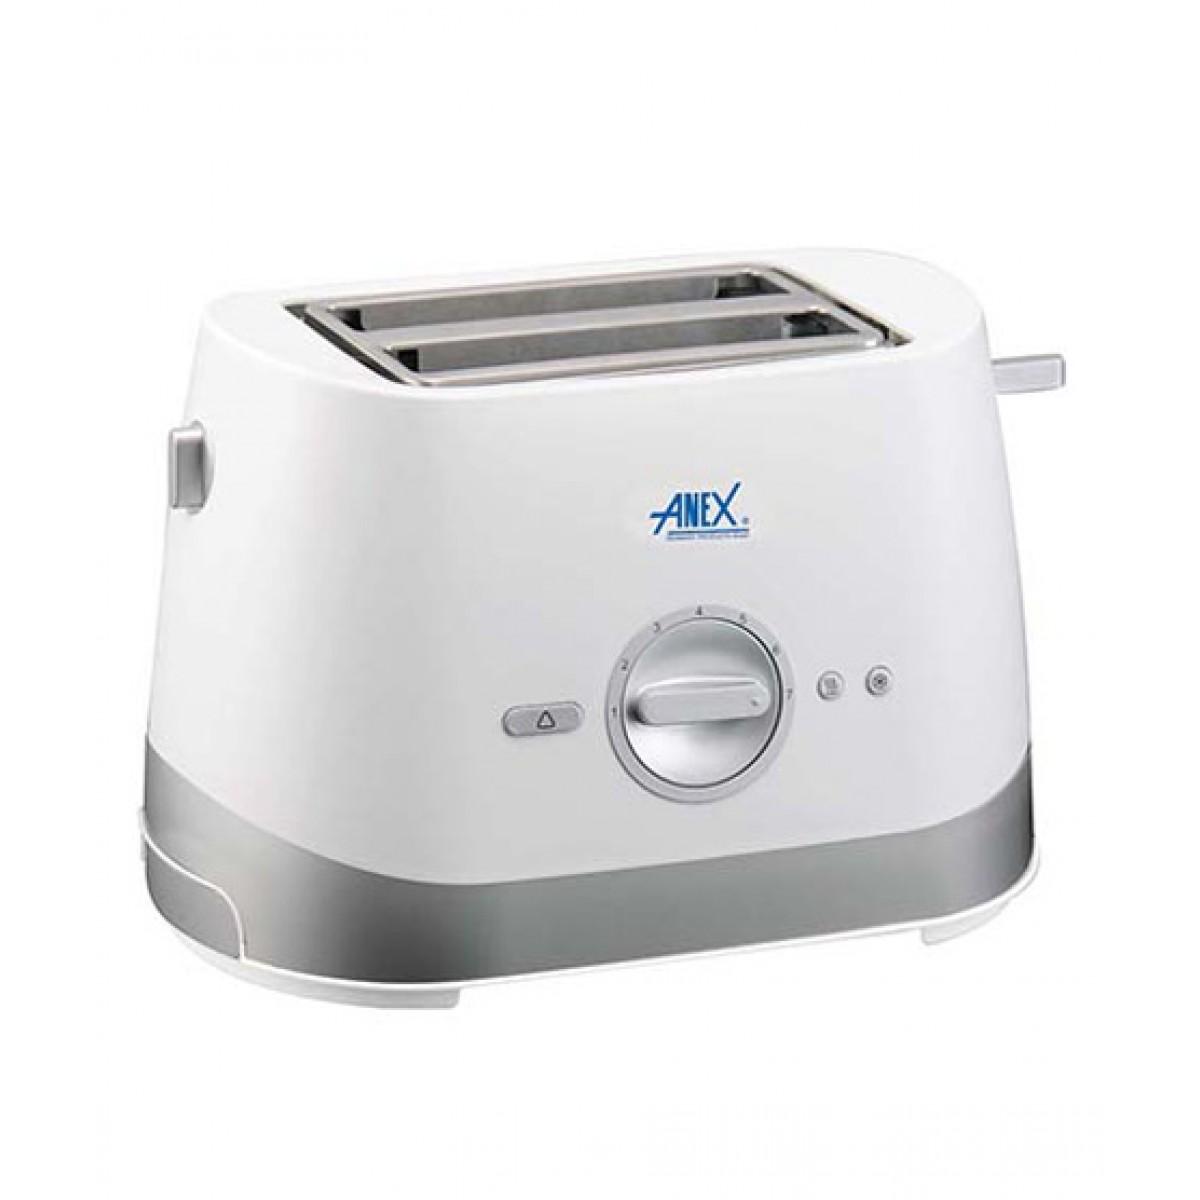 Anex 2 Slice Toaster (AG-3019)